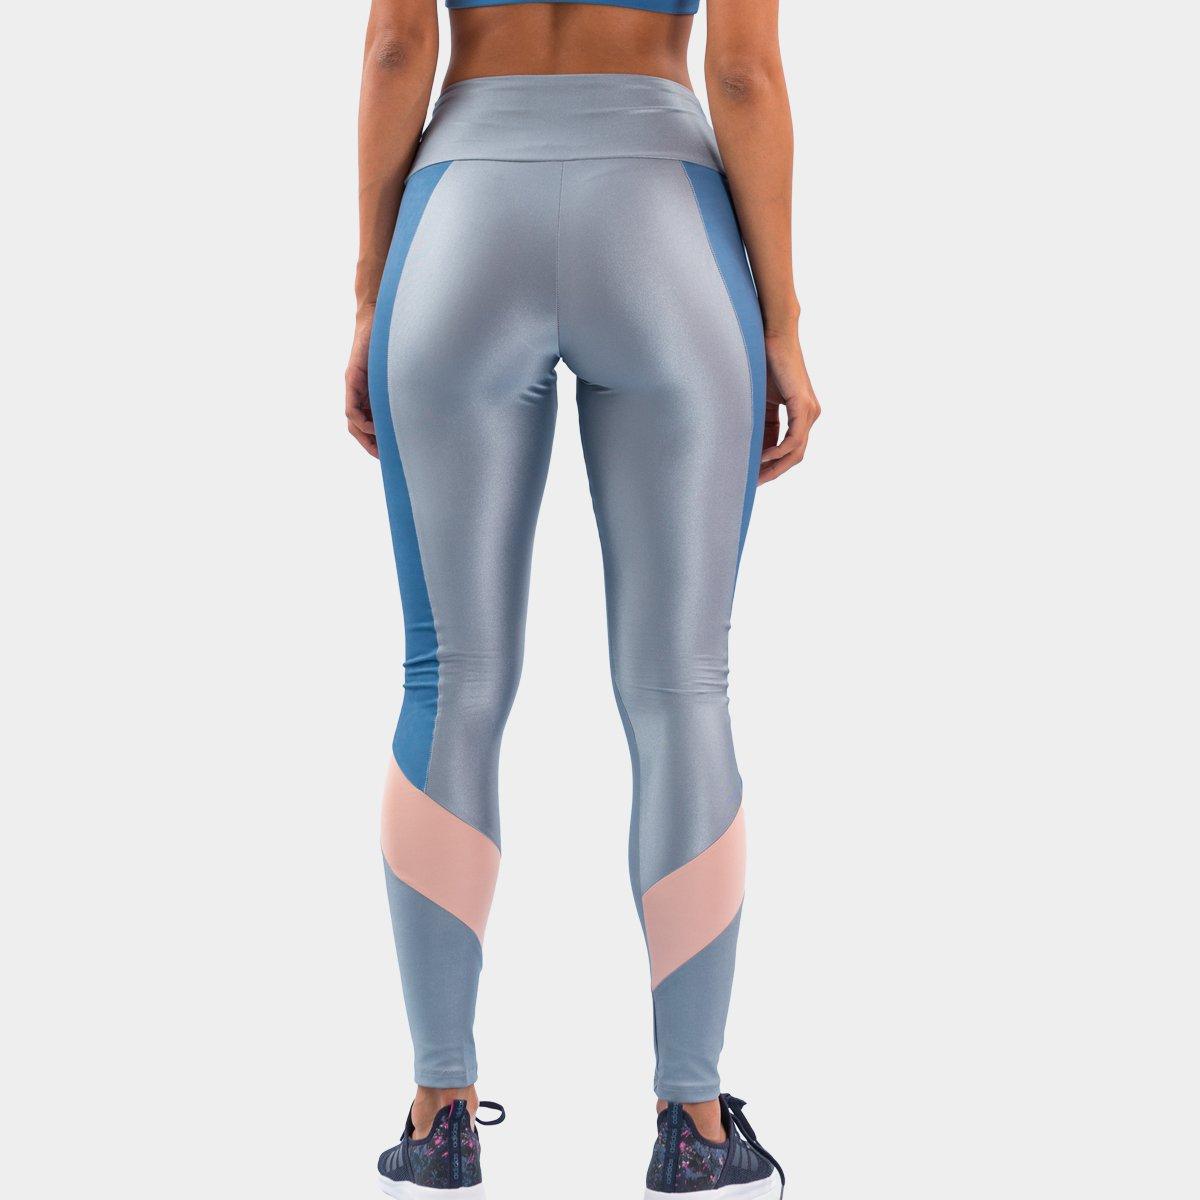 Calça Legging Área Sports Load Feminina - Tam: GG - 1